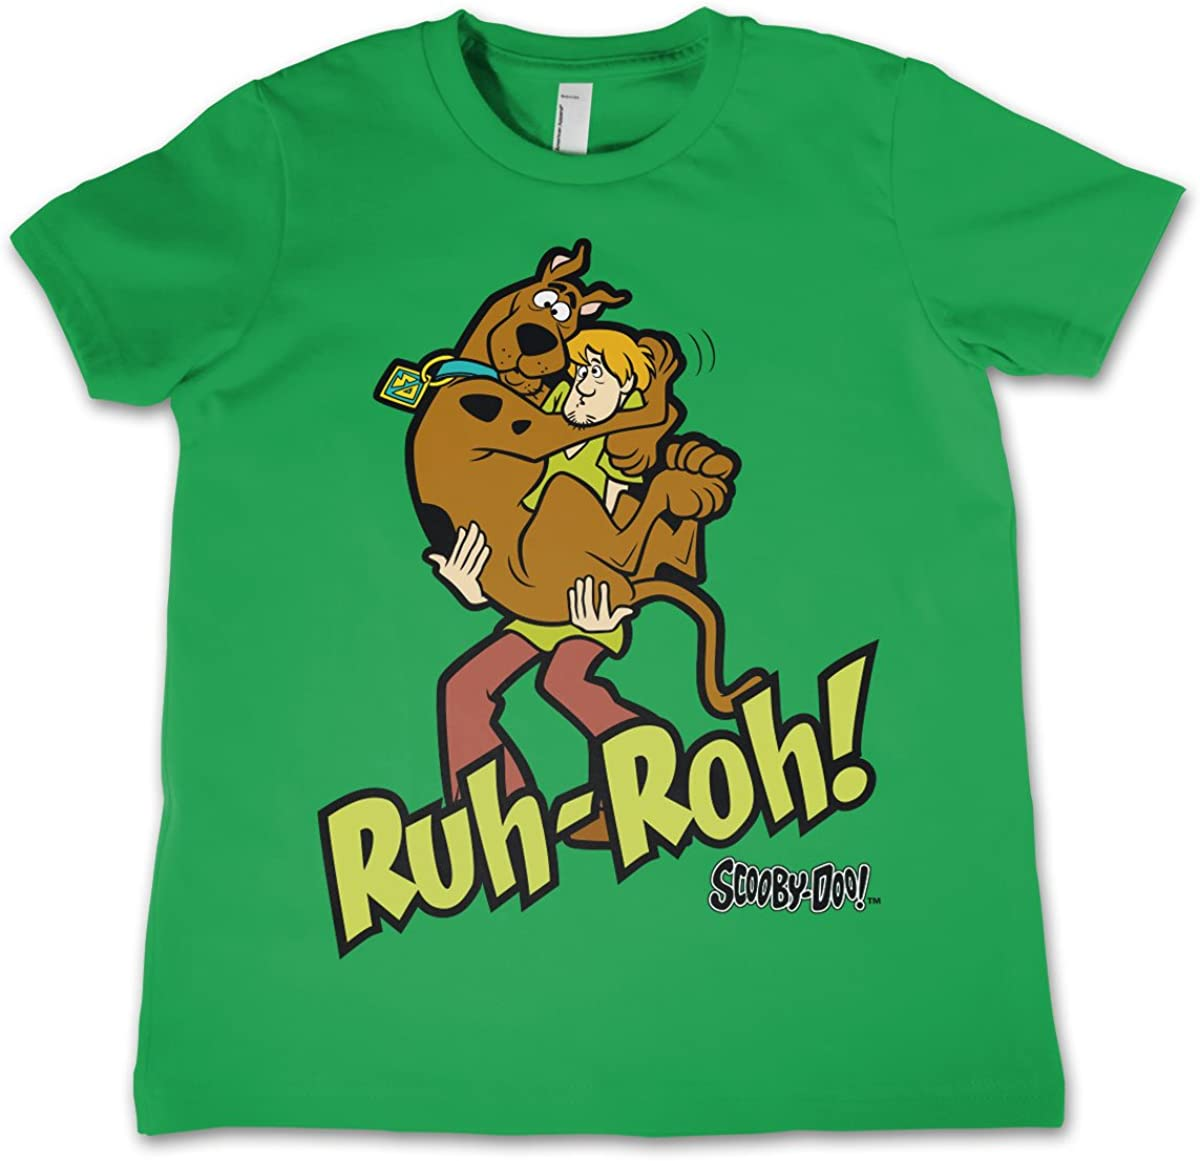 Scooby Doo Licenza Ufficiale Ruh-Ruh Unisex Bambino Maglietta et/à 3-12 Anni